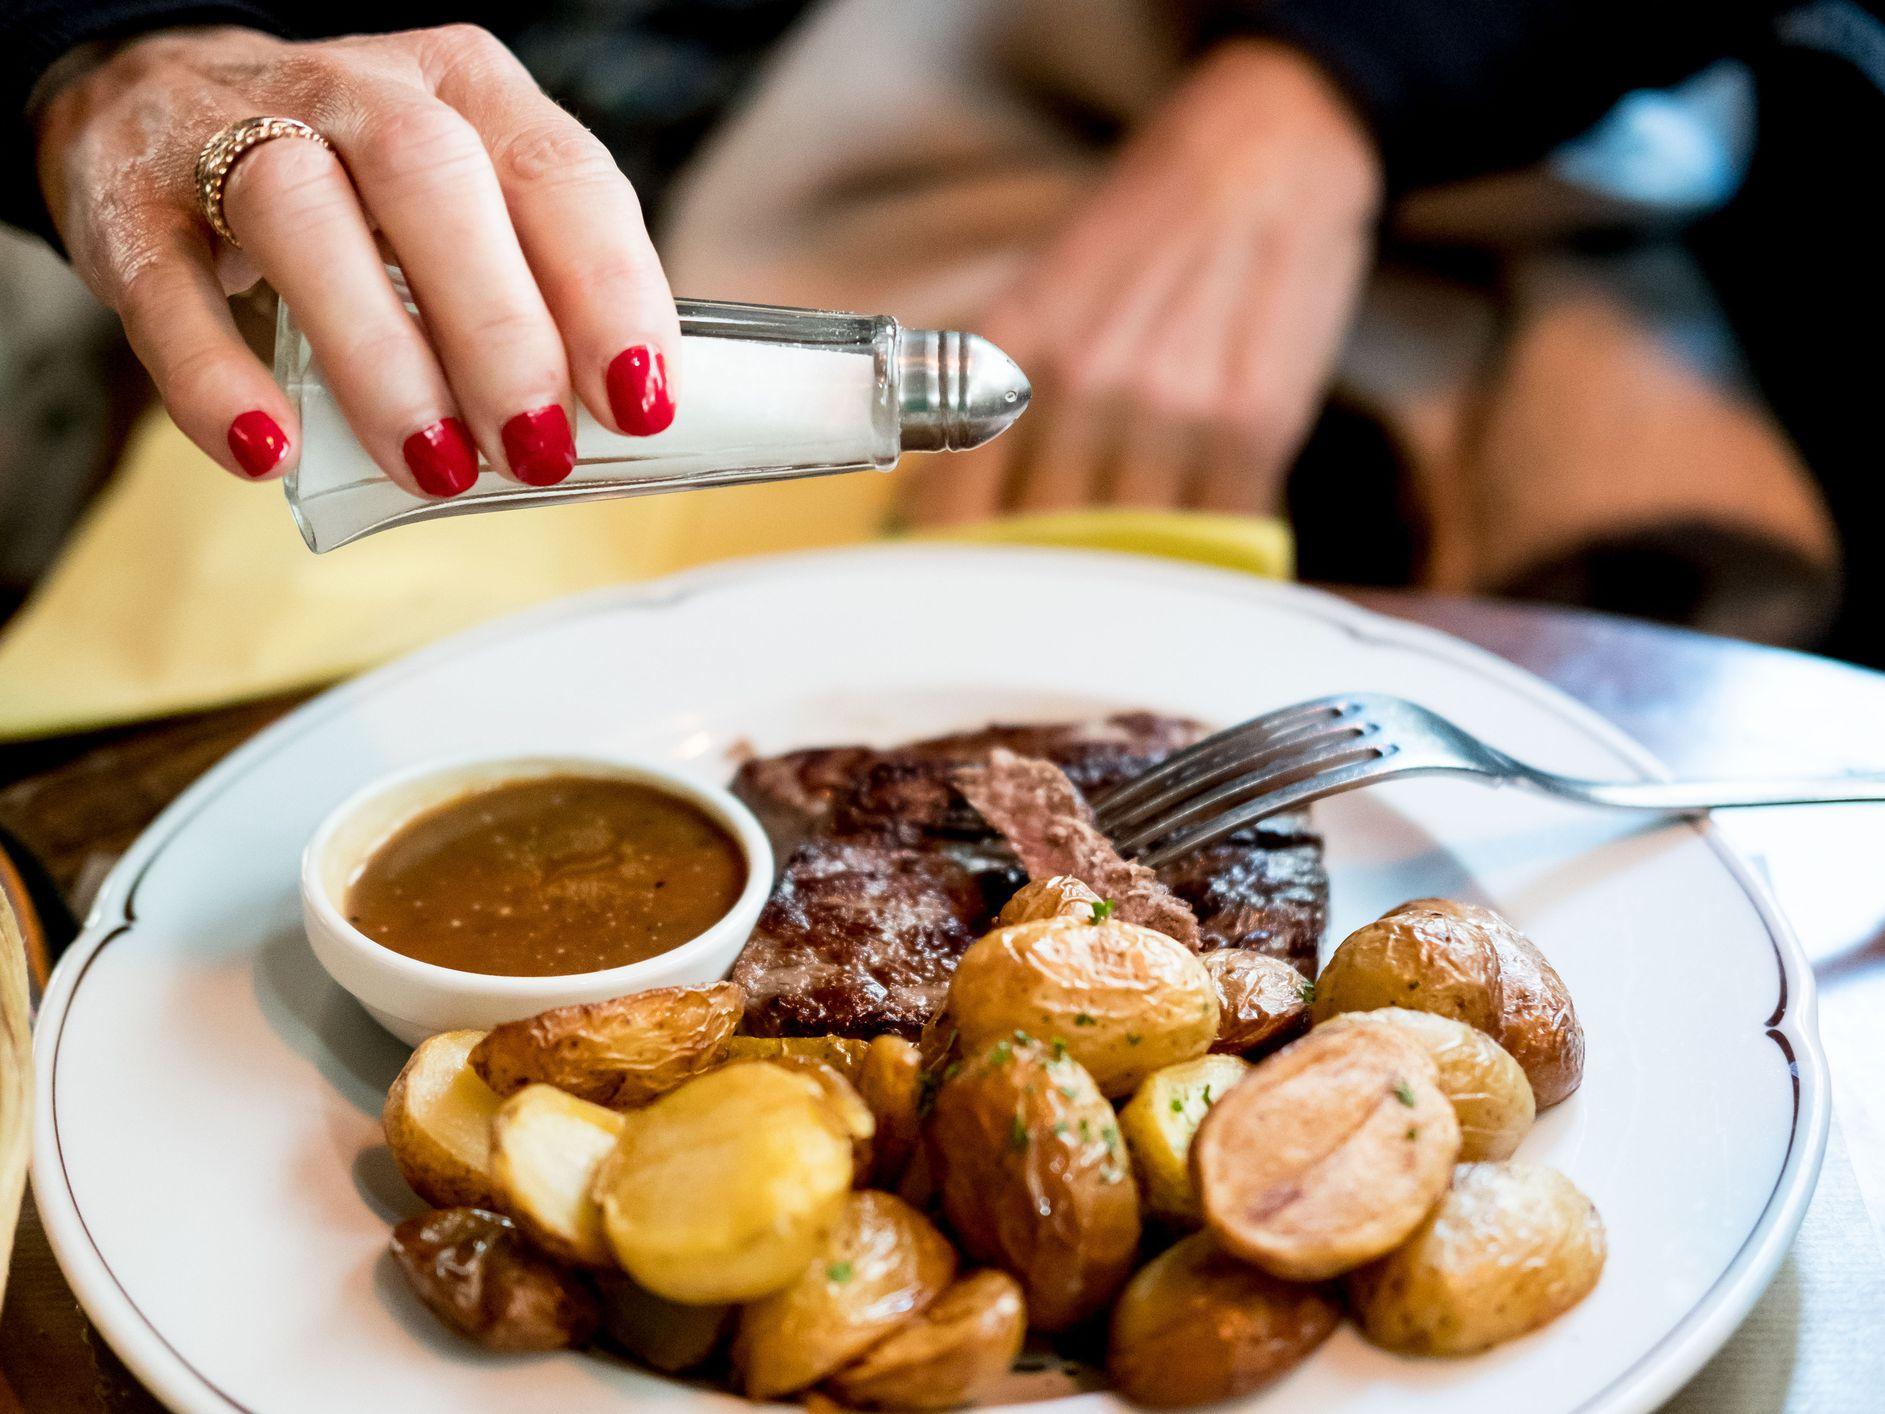 Does Salty Food Make Blood Pressure Go Up